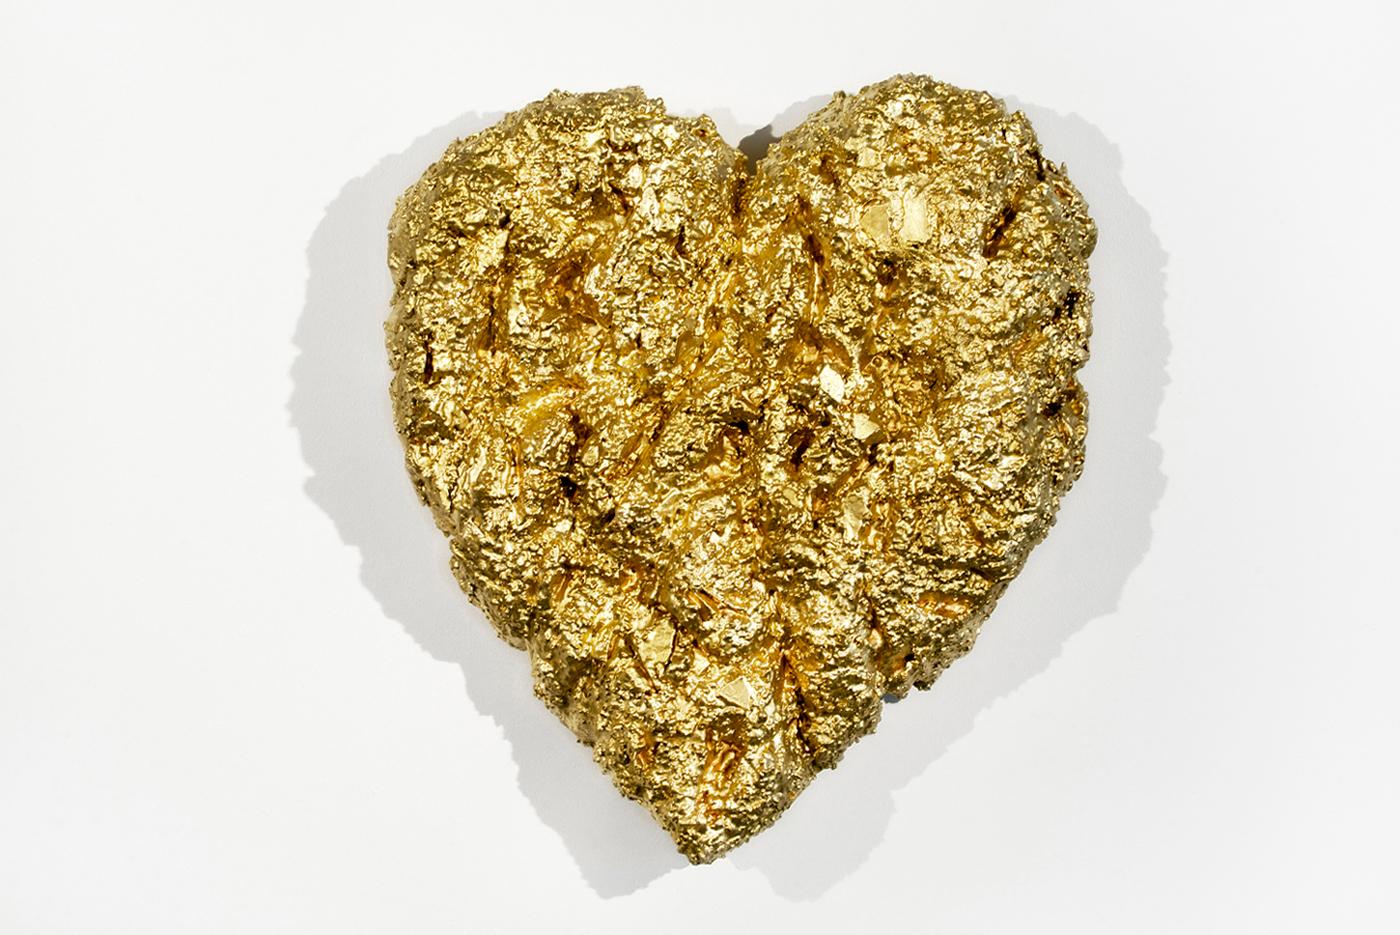 Heart of gold dgg2km